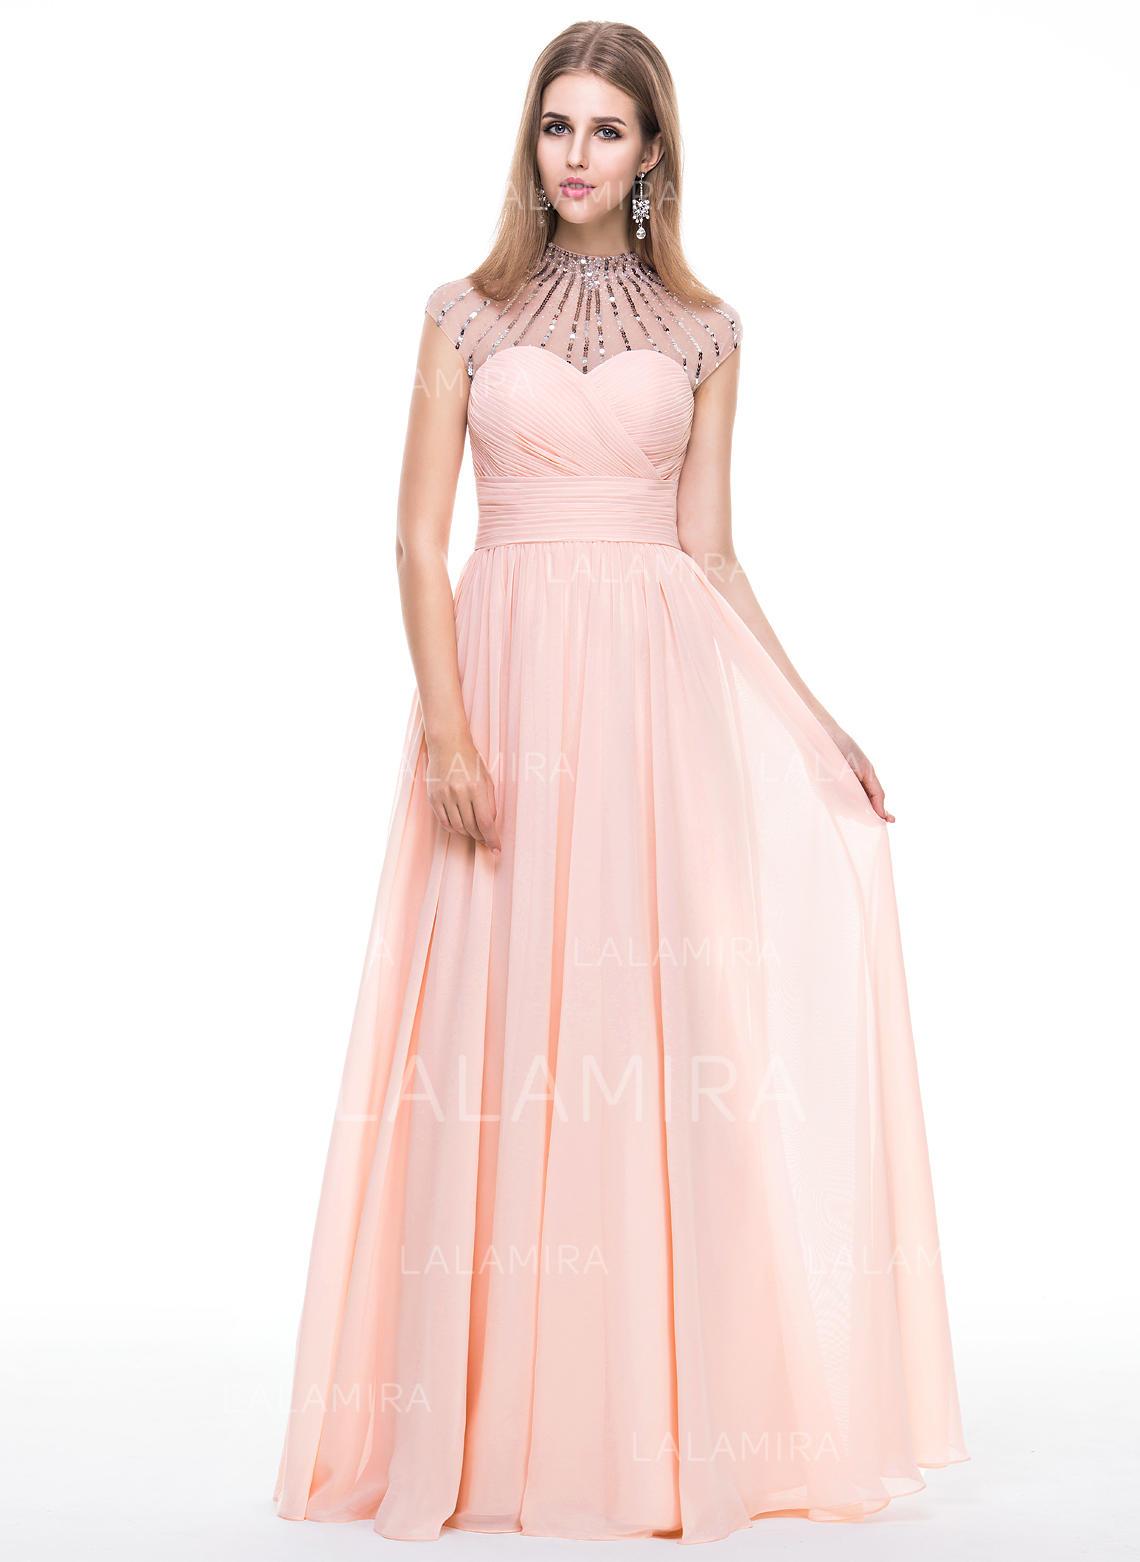 A-Line Princess Prom Dresses Delicate Floor-Length Scoop Neck Sleeveless  (018056787. Loading zoom 5b4154d50